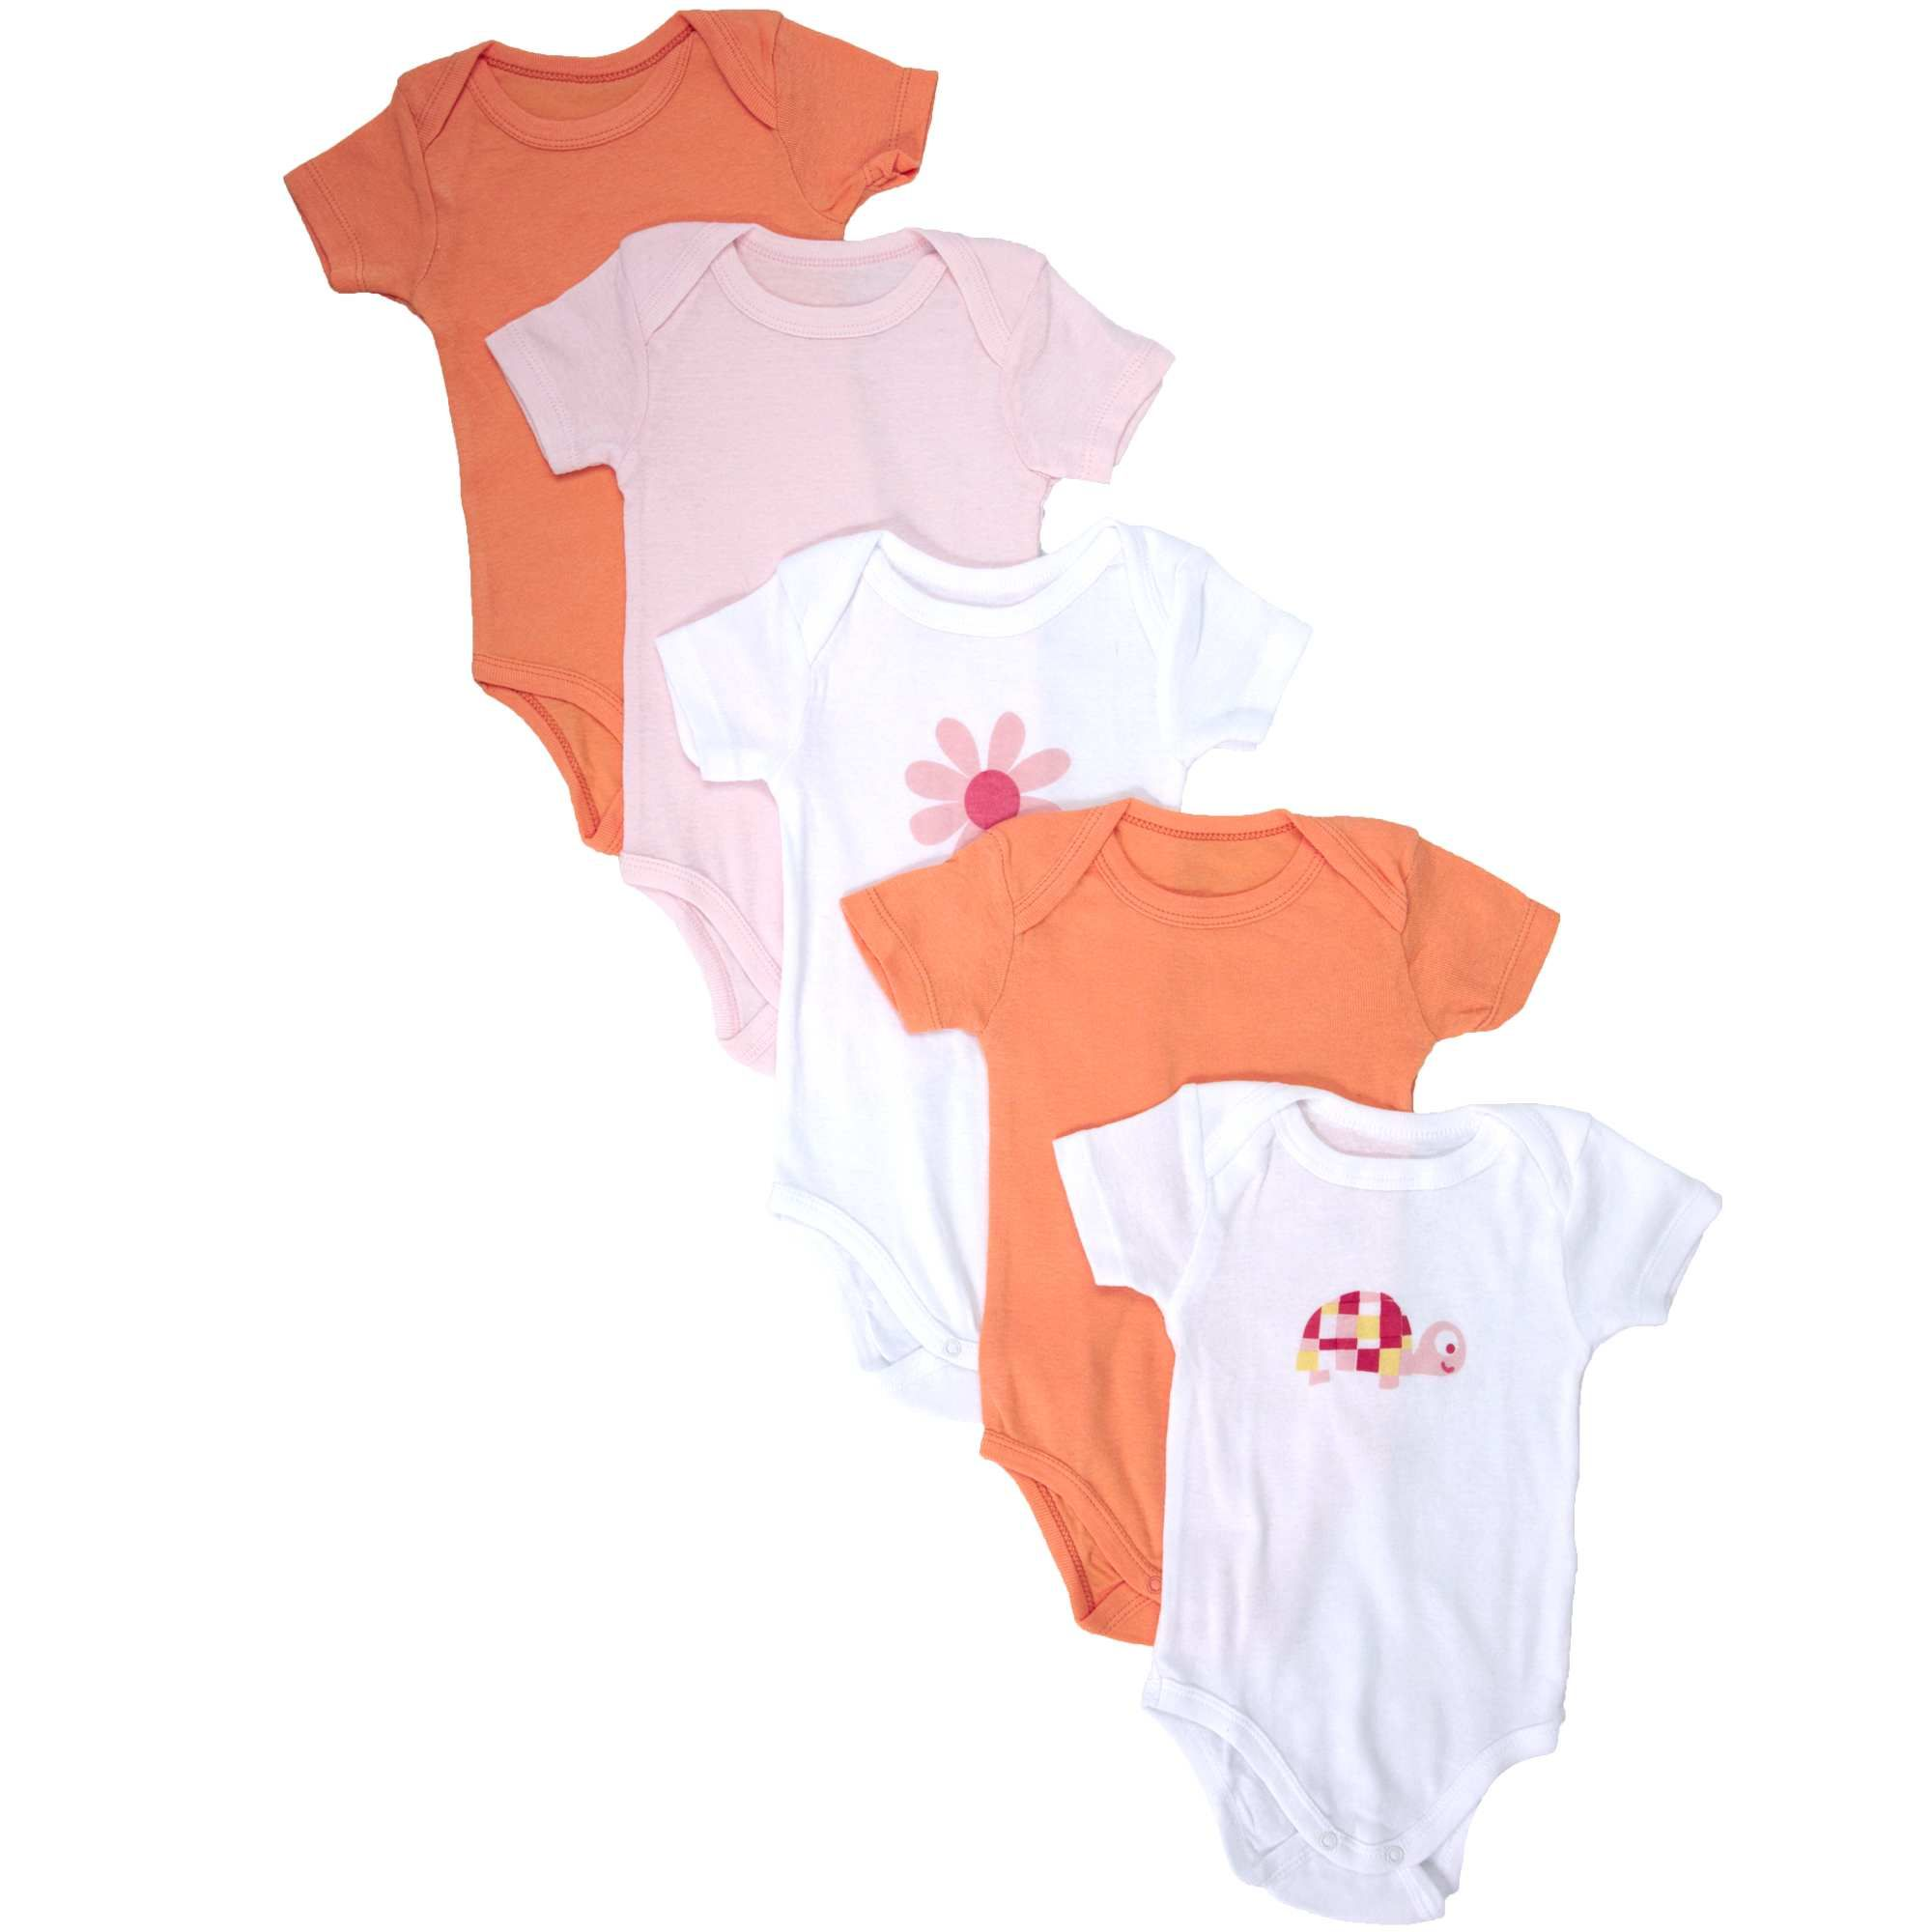 Lote de 5 bodies de algodón Bebé niña - Kiabi - 6,99€